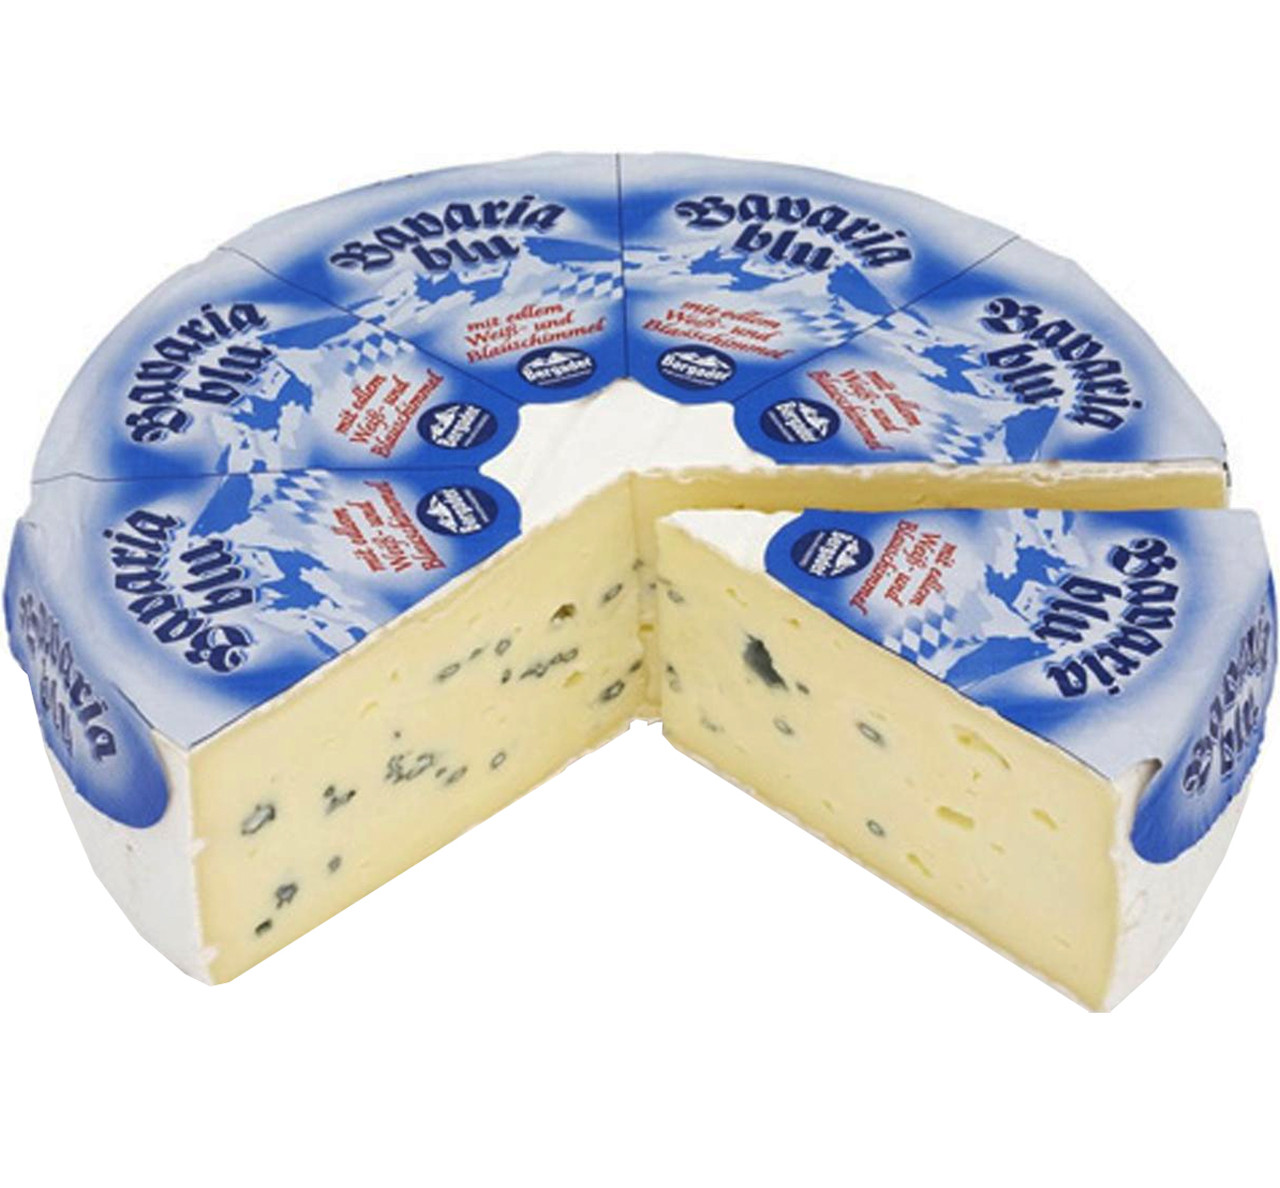 Мягкий сыр с голубой плесенью Bavaria Blu Torte (Бавария Блю) 50%, кг.